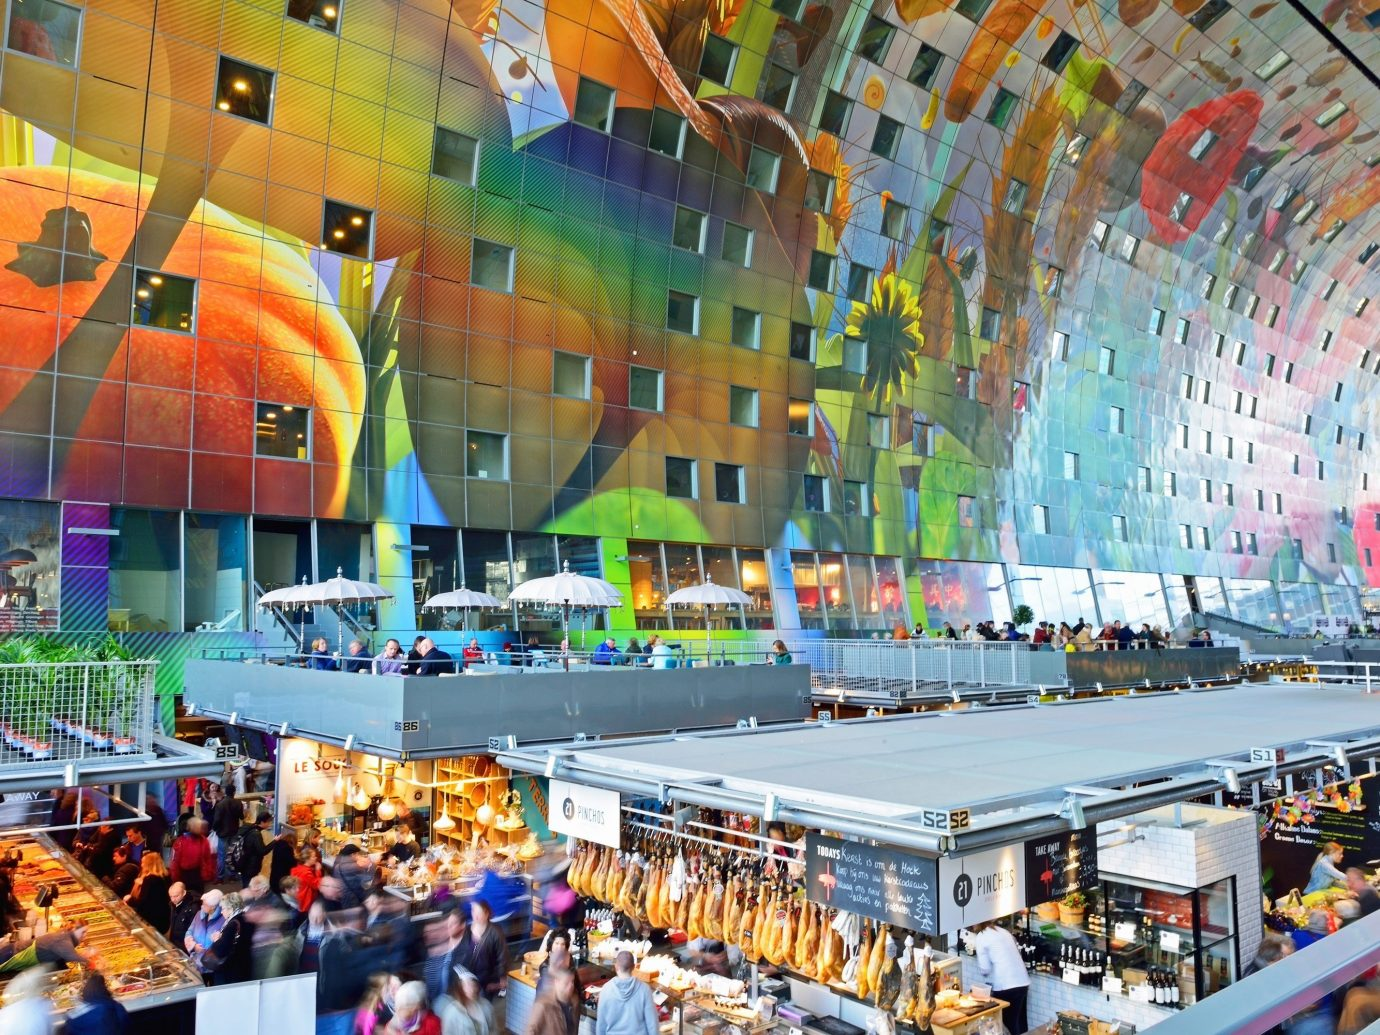 Trip Ideas indoor shopping mall supermarket infrastructure arena orange